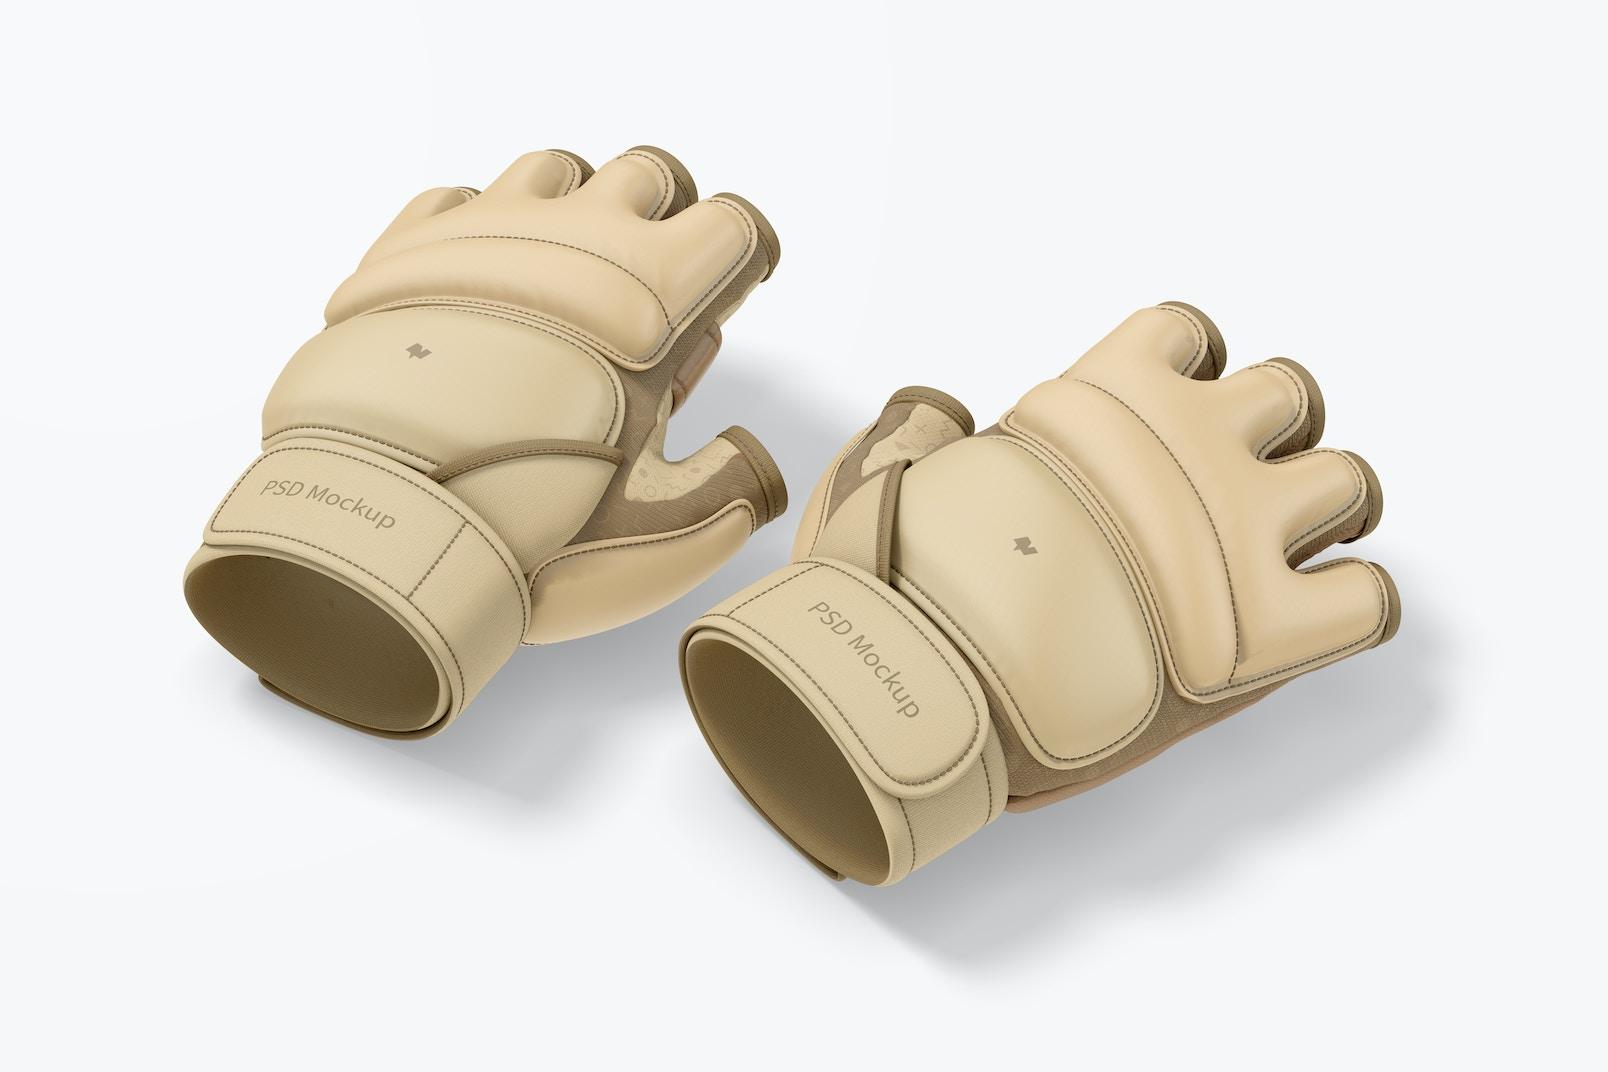 Taekwondo Gloves Mockup, Perspective